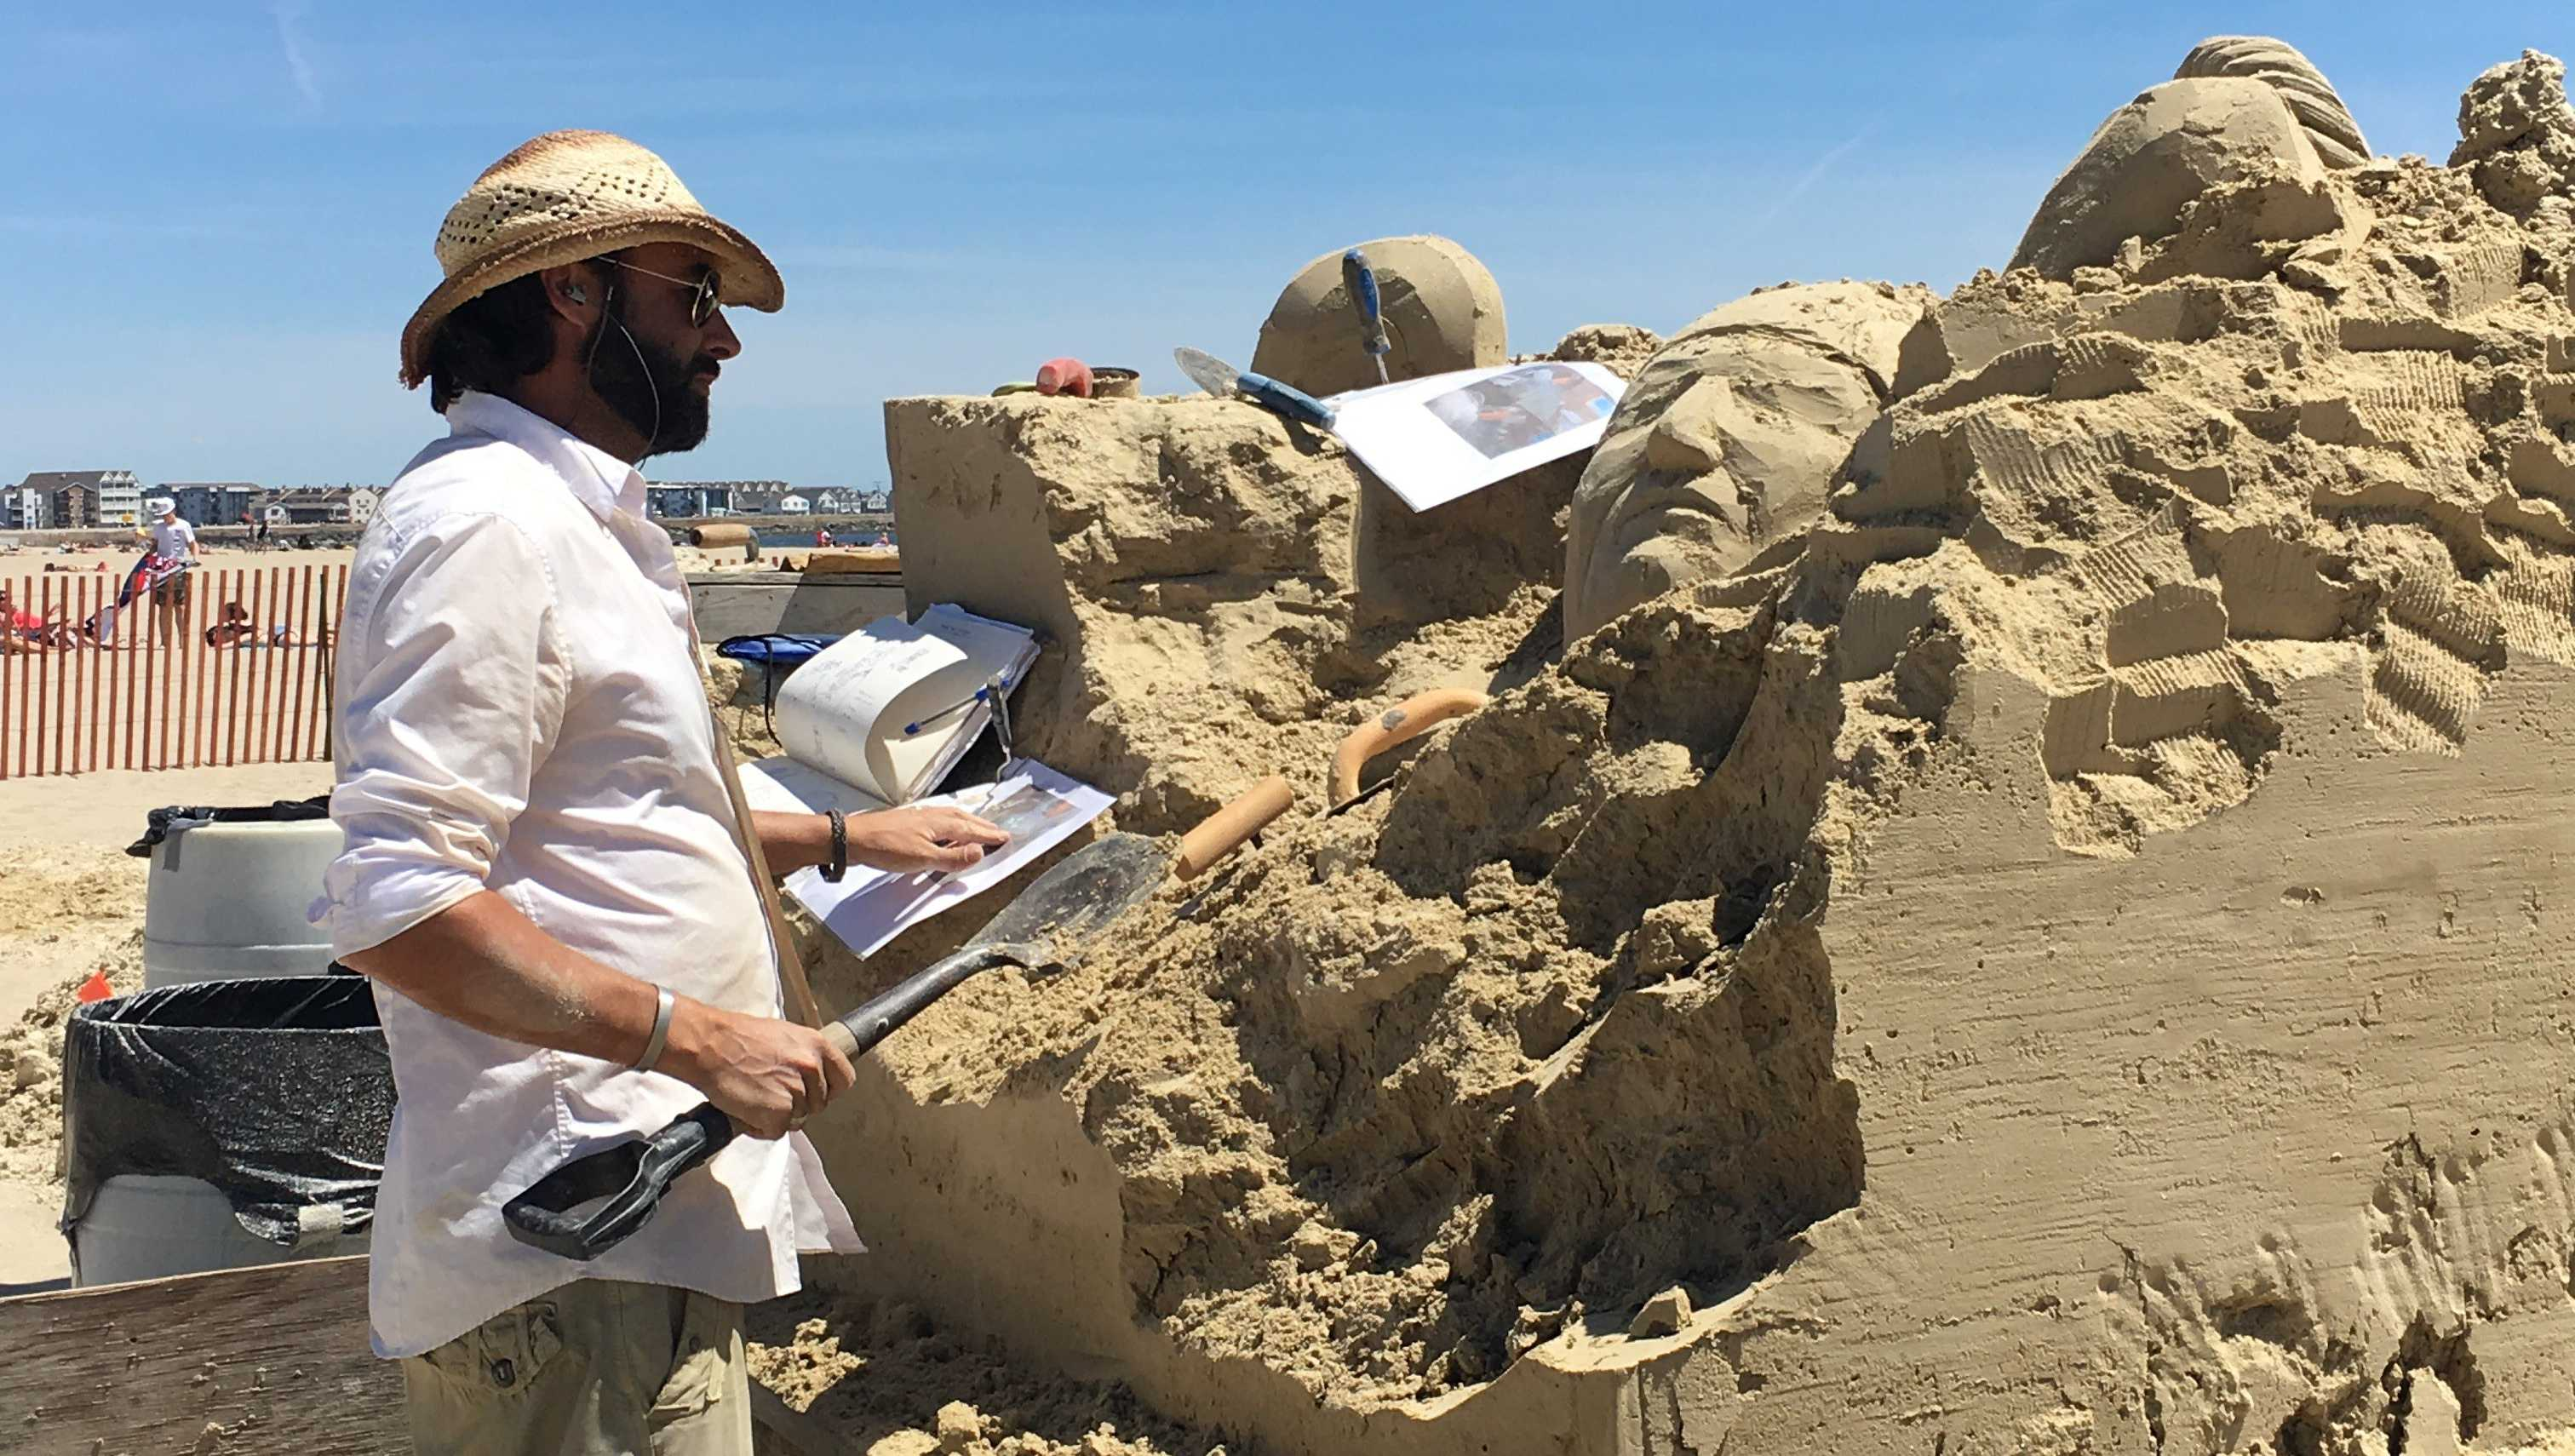 Hampton Beach Master Sand Sculpting Classic